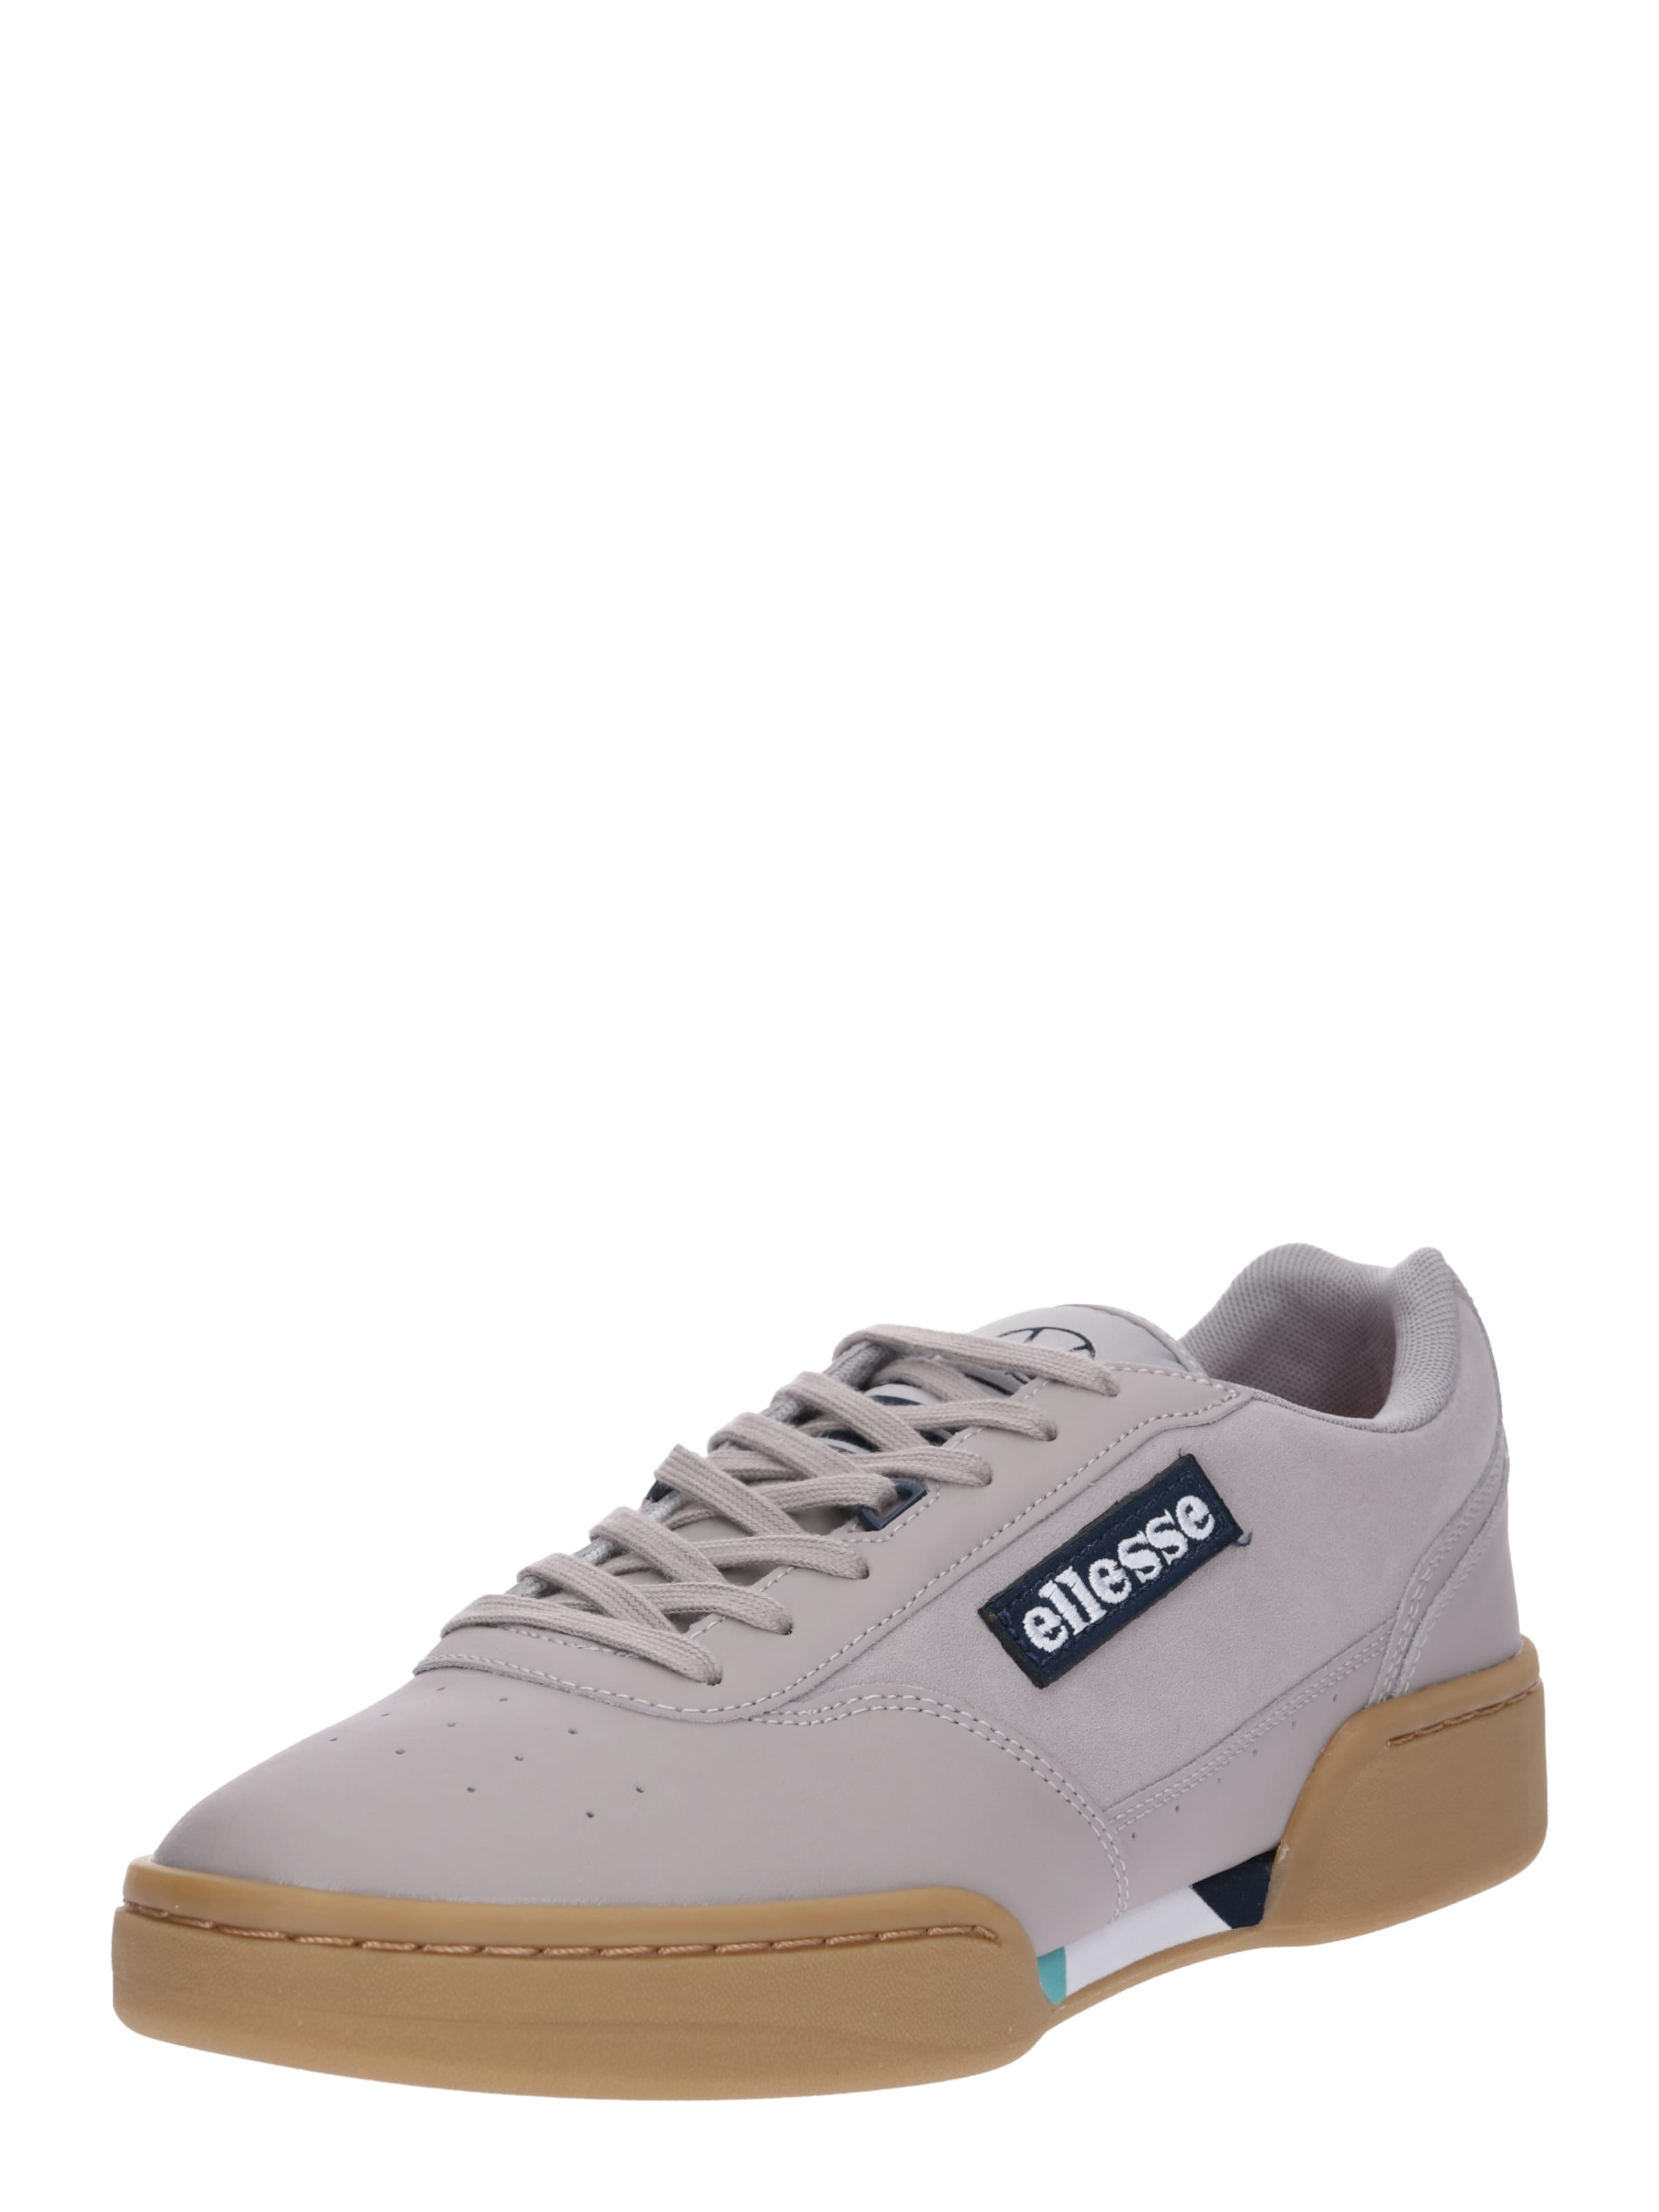 In Am' Hellgrau Ellesse Sneaker 'piacentino Bdg Lthr 5RjLcA34q